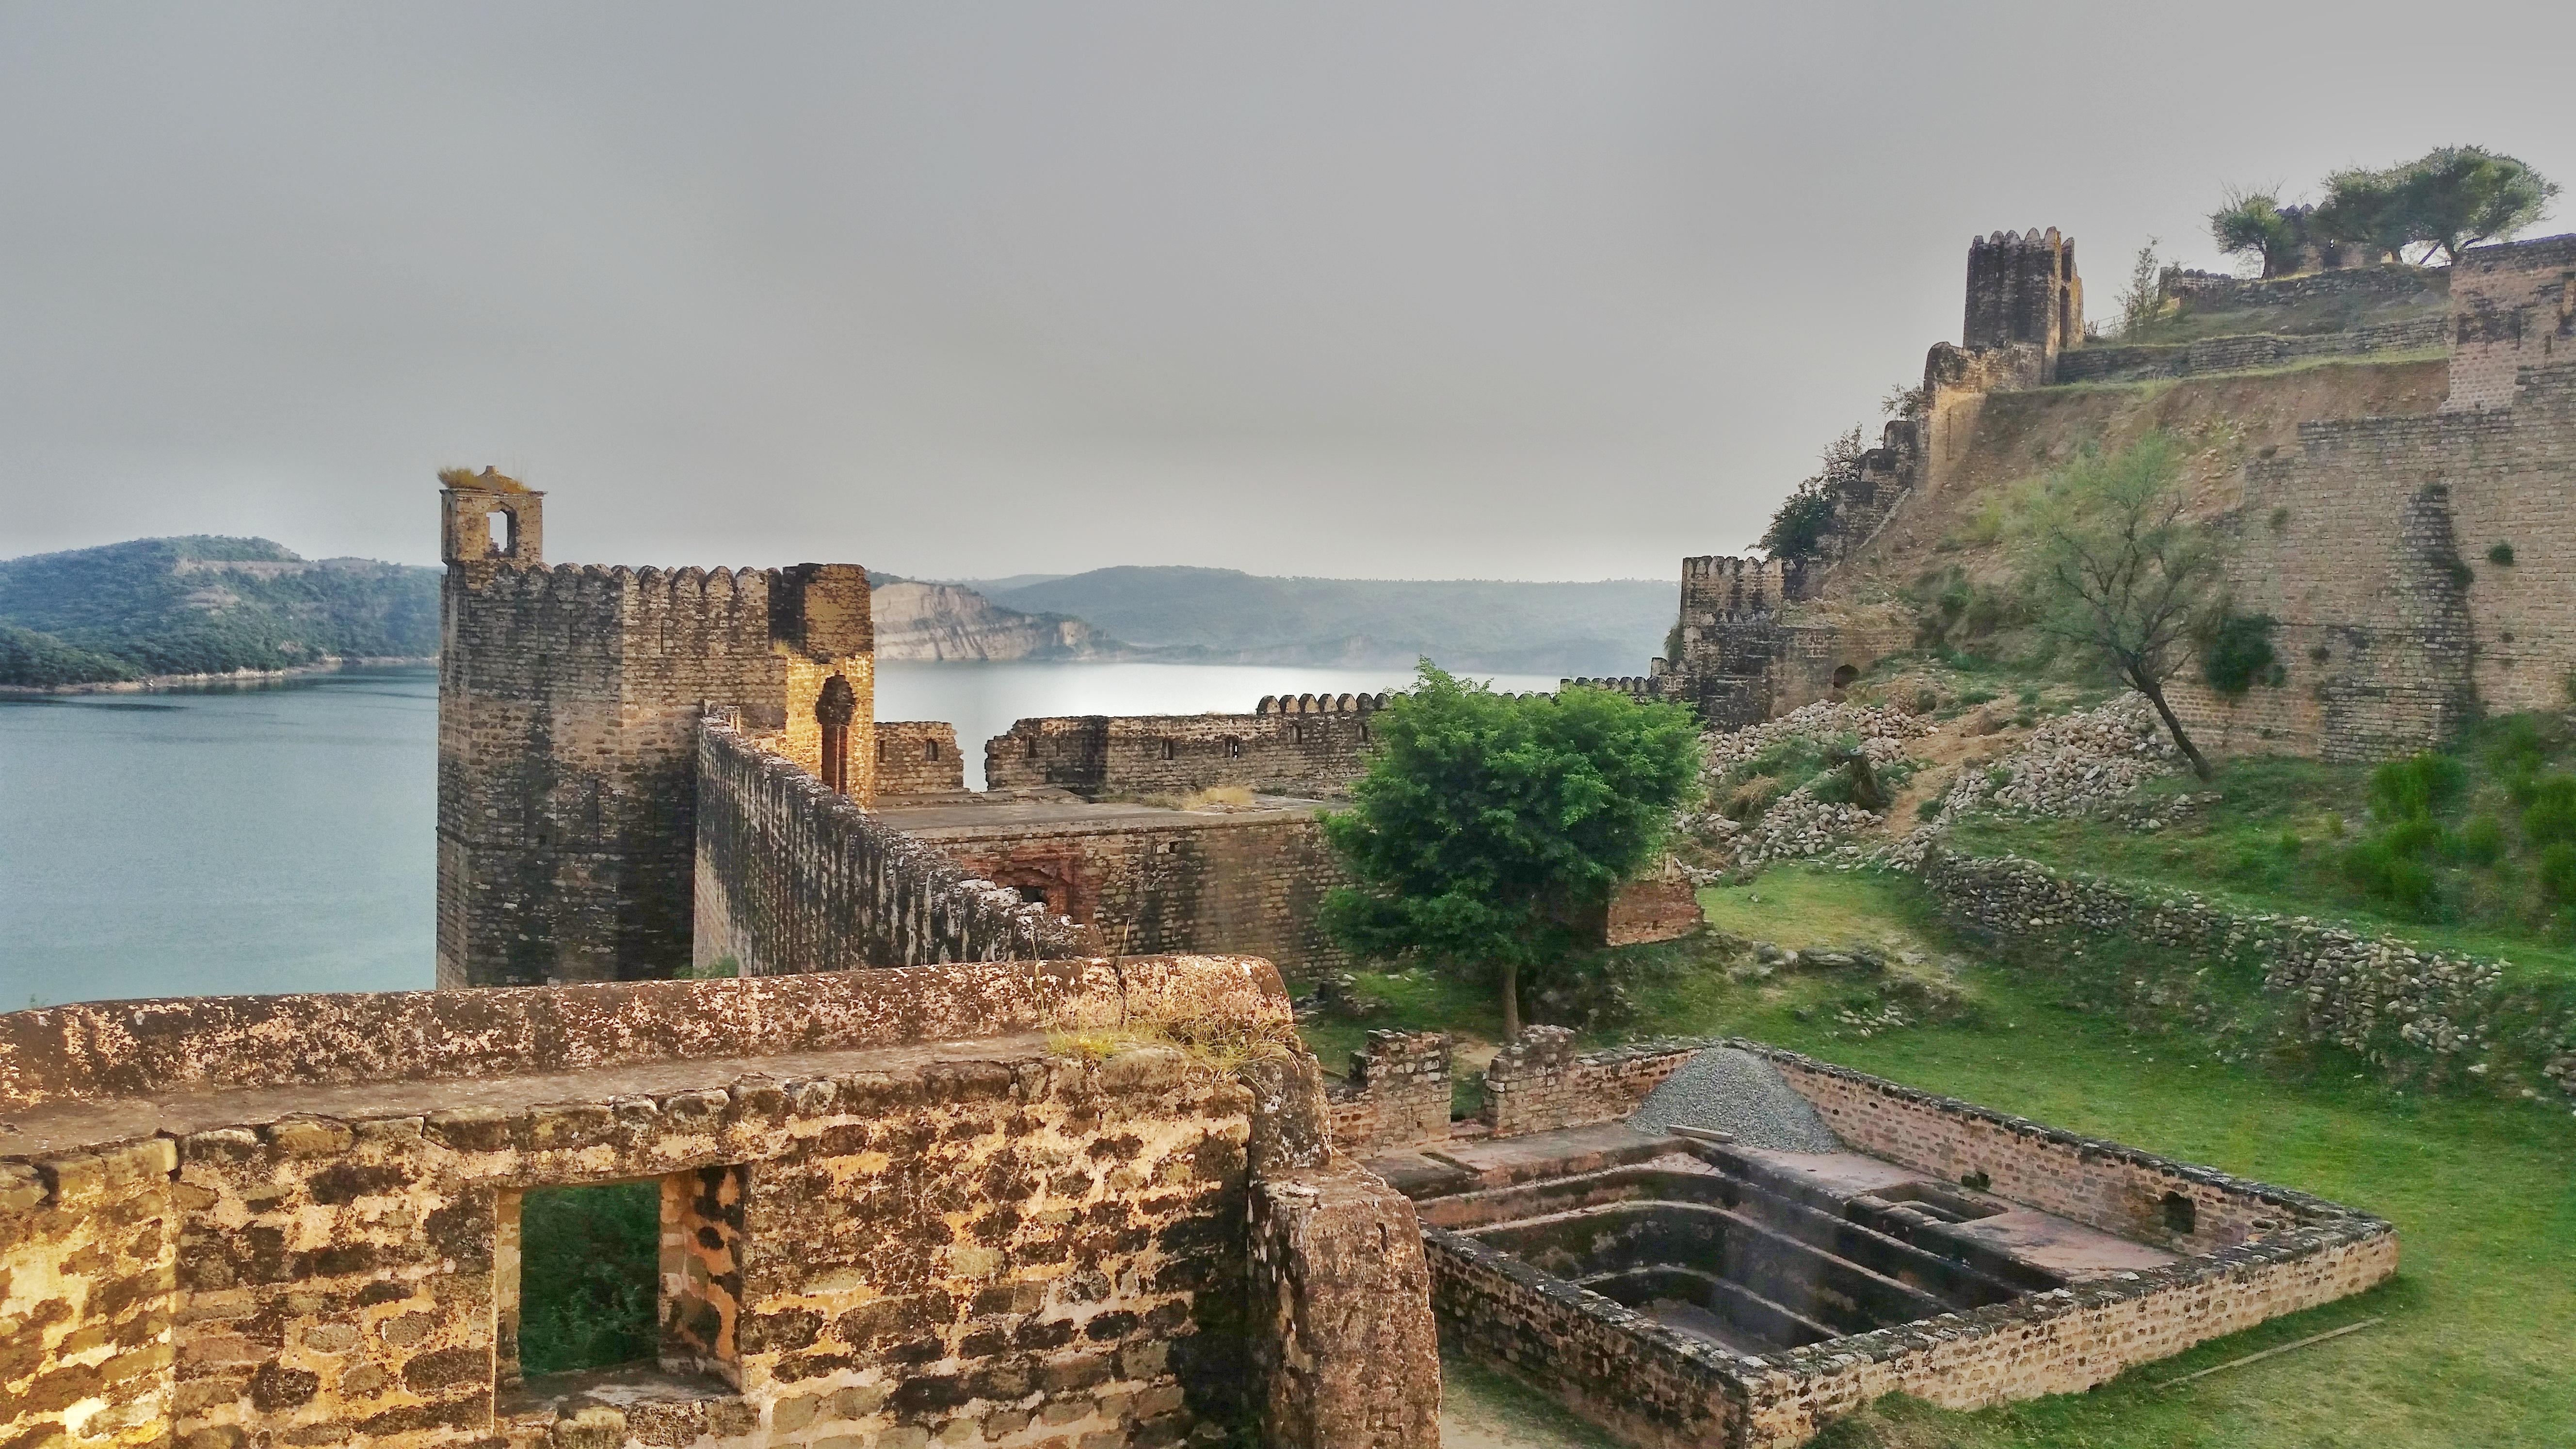 Home Page - Have Fun | Jhelum, Dam, Fort